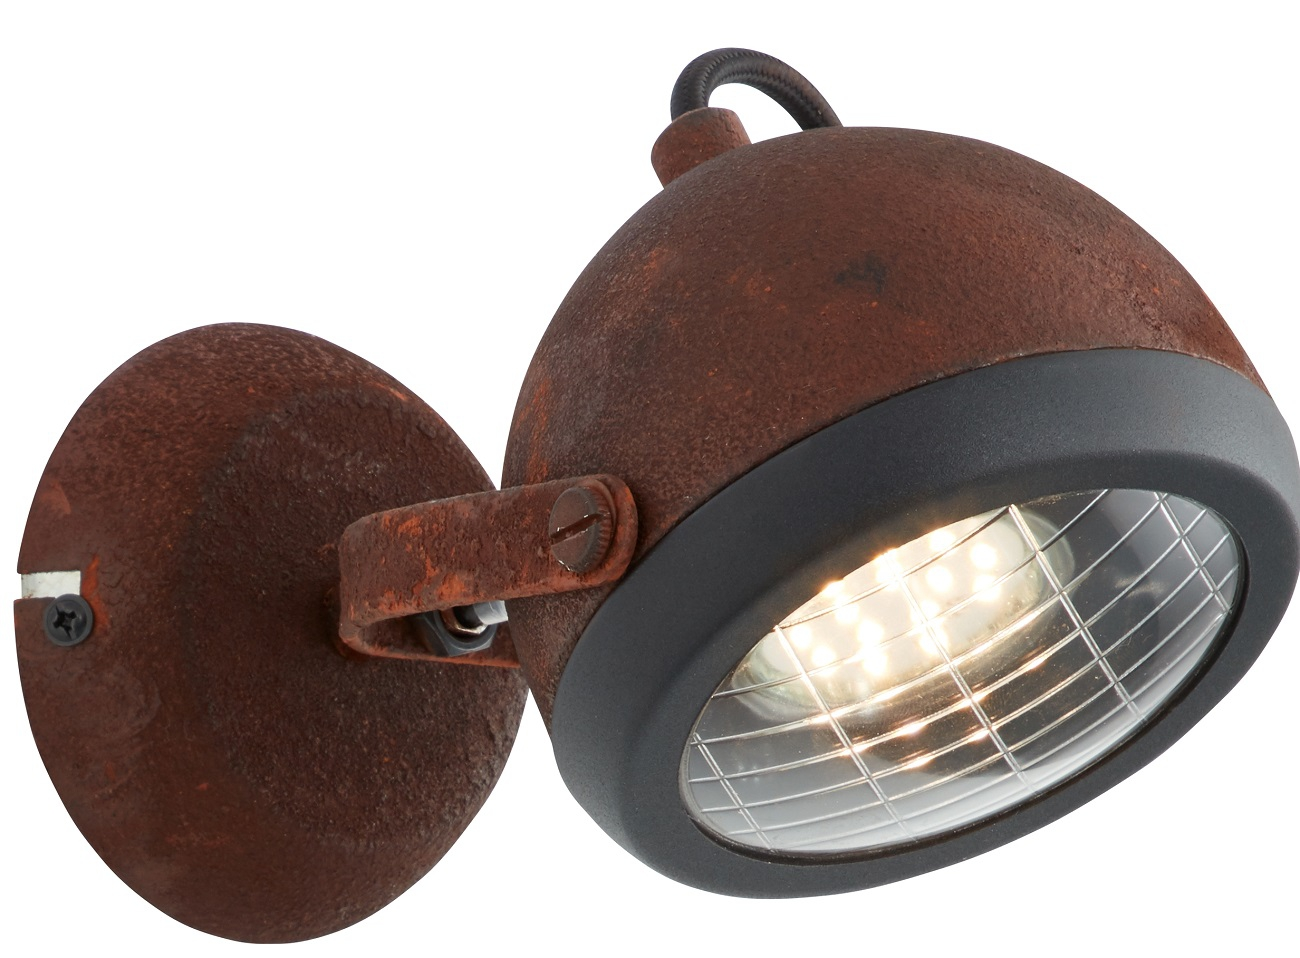 Wandlamp Relax 1xGU10 max 1x4Watt in roestbruin | Brilliant